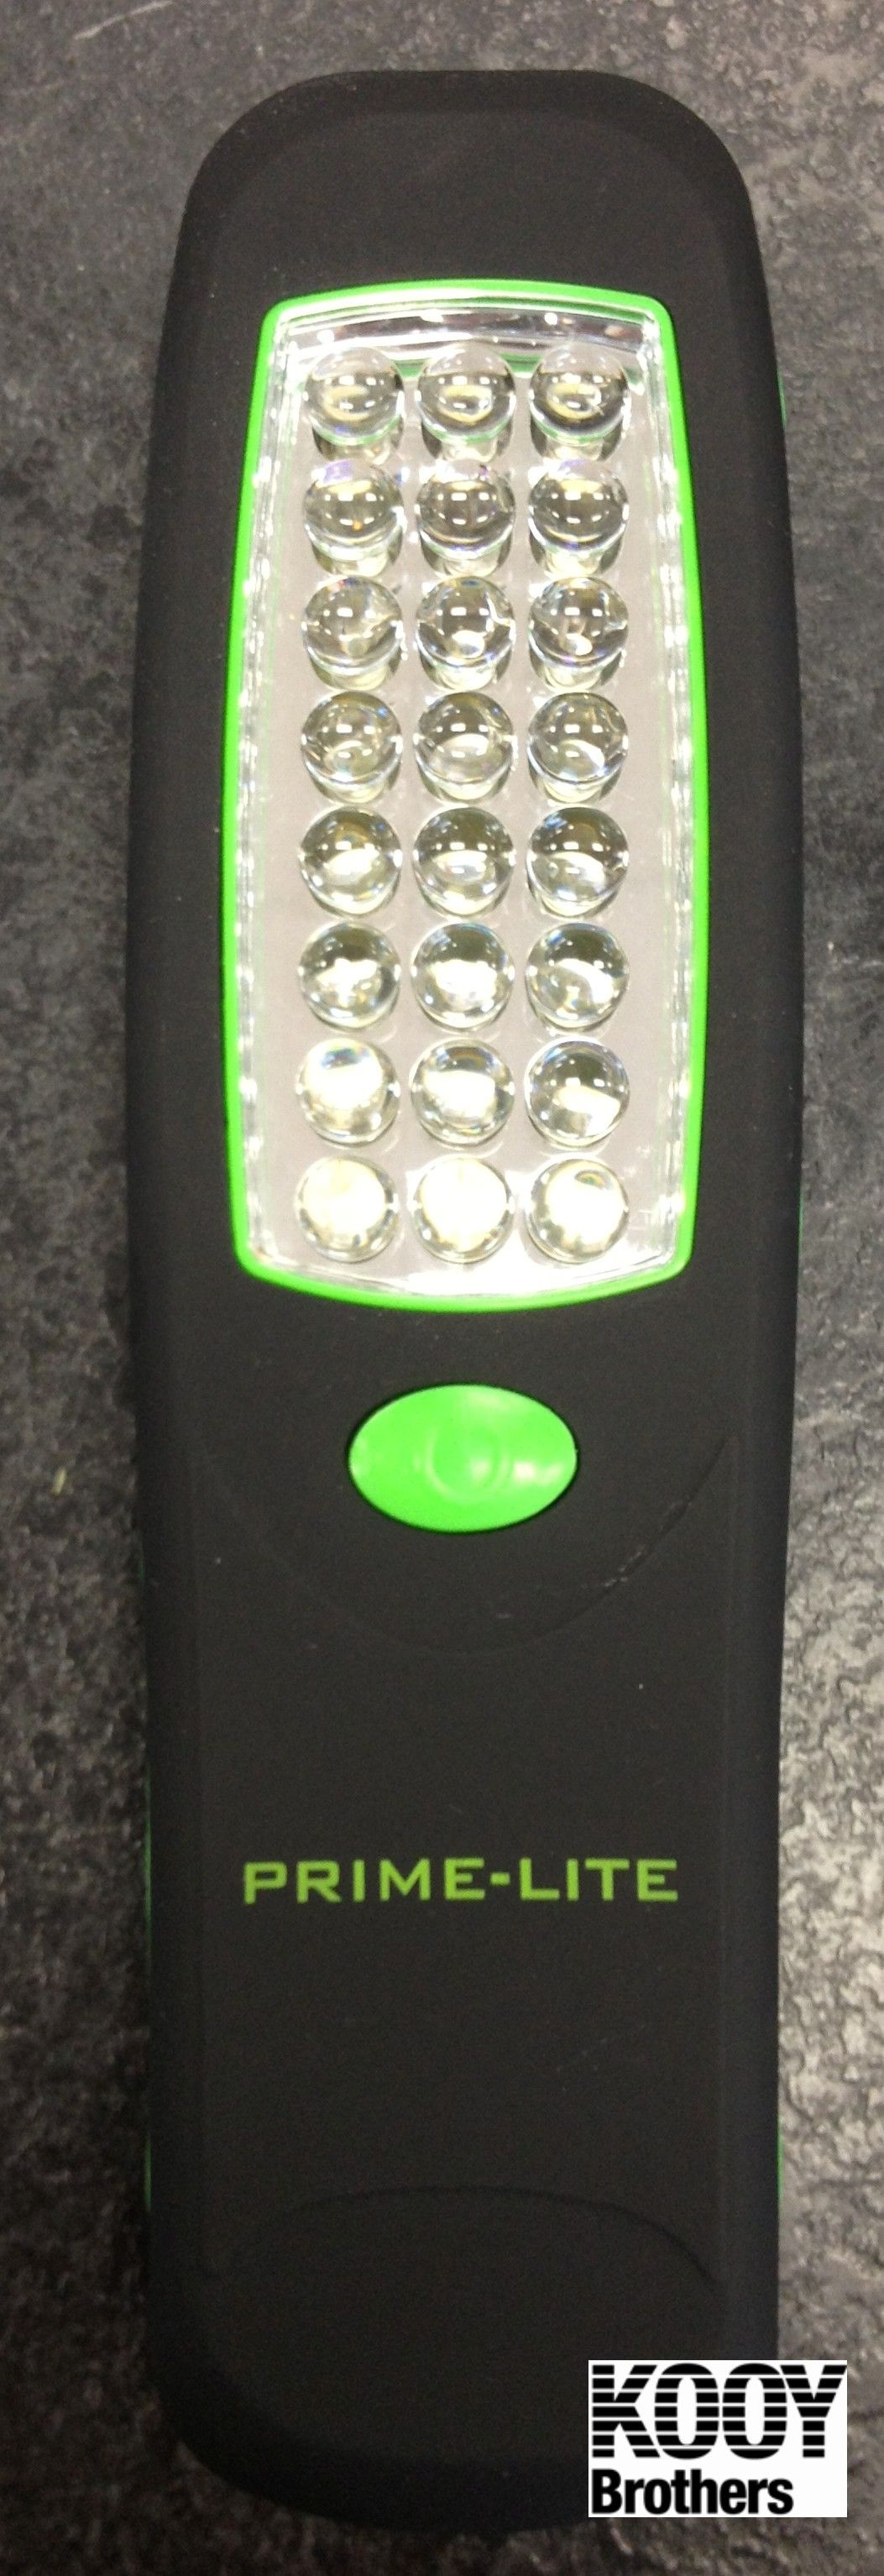 Prime-Lite Handheld worklight model 24-457